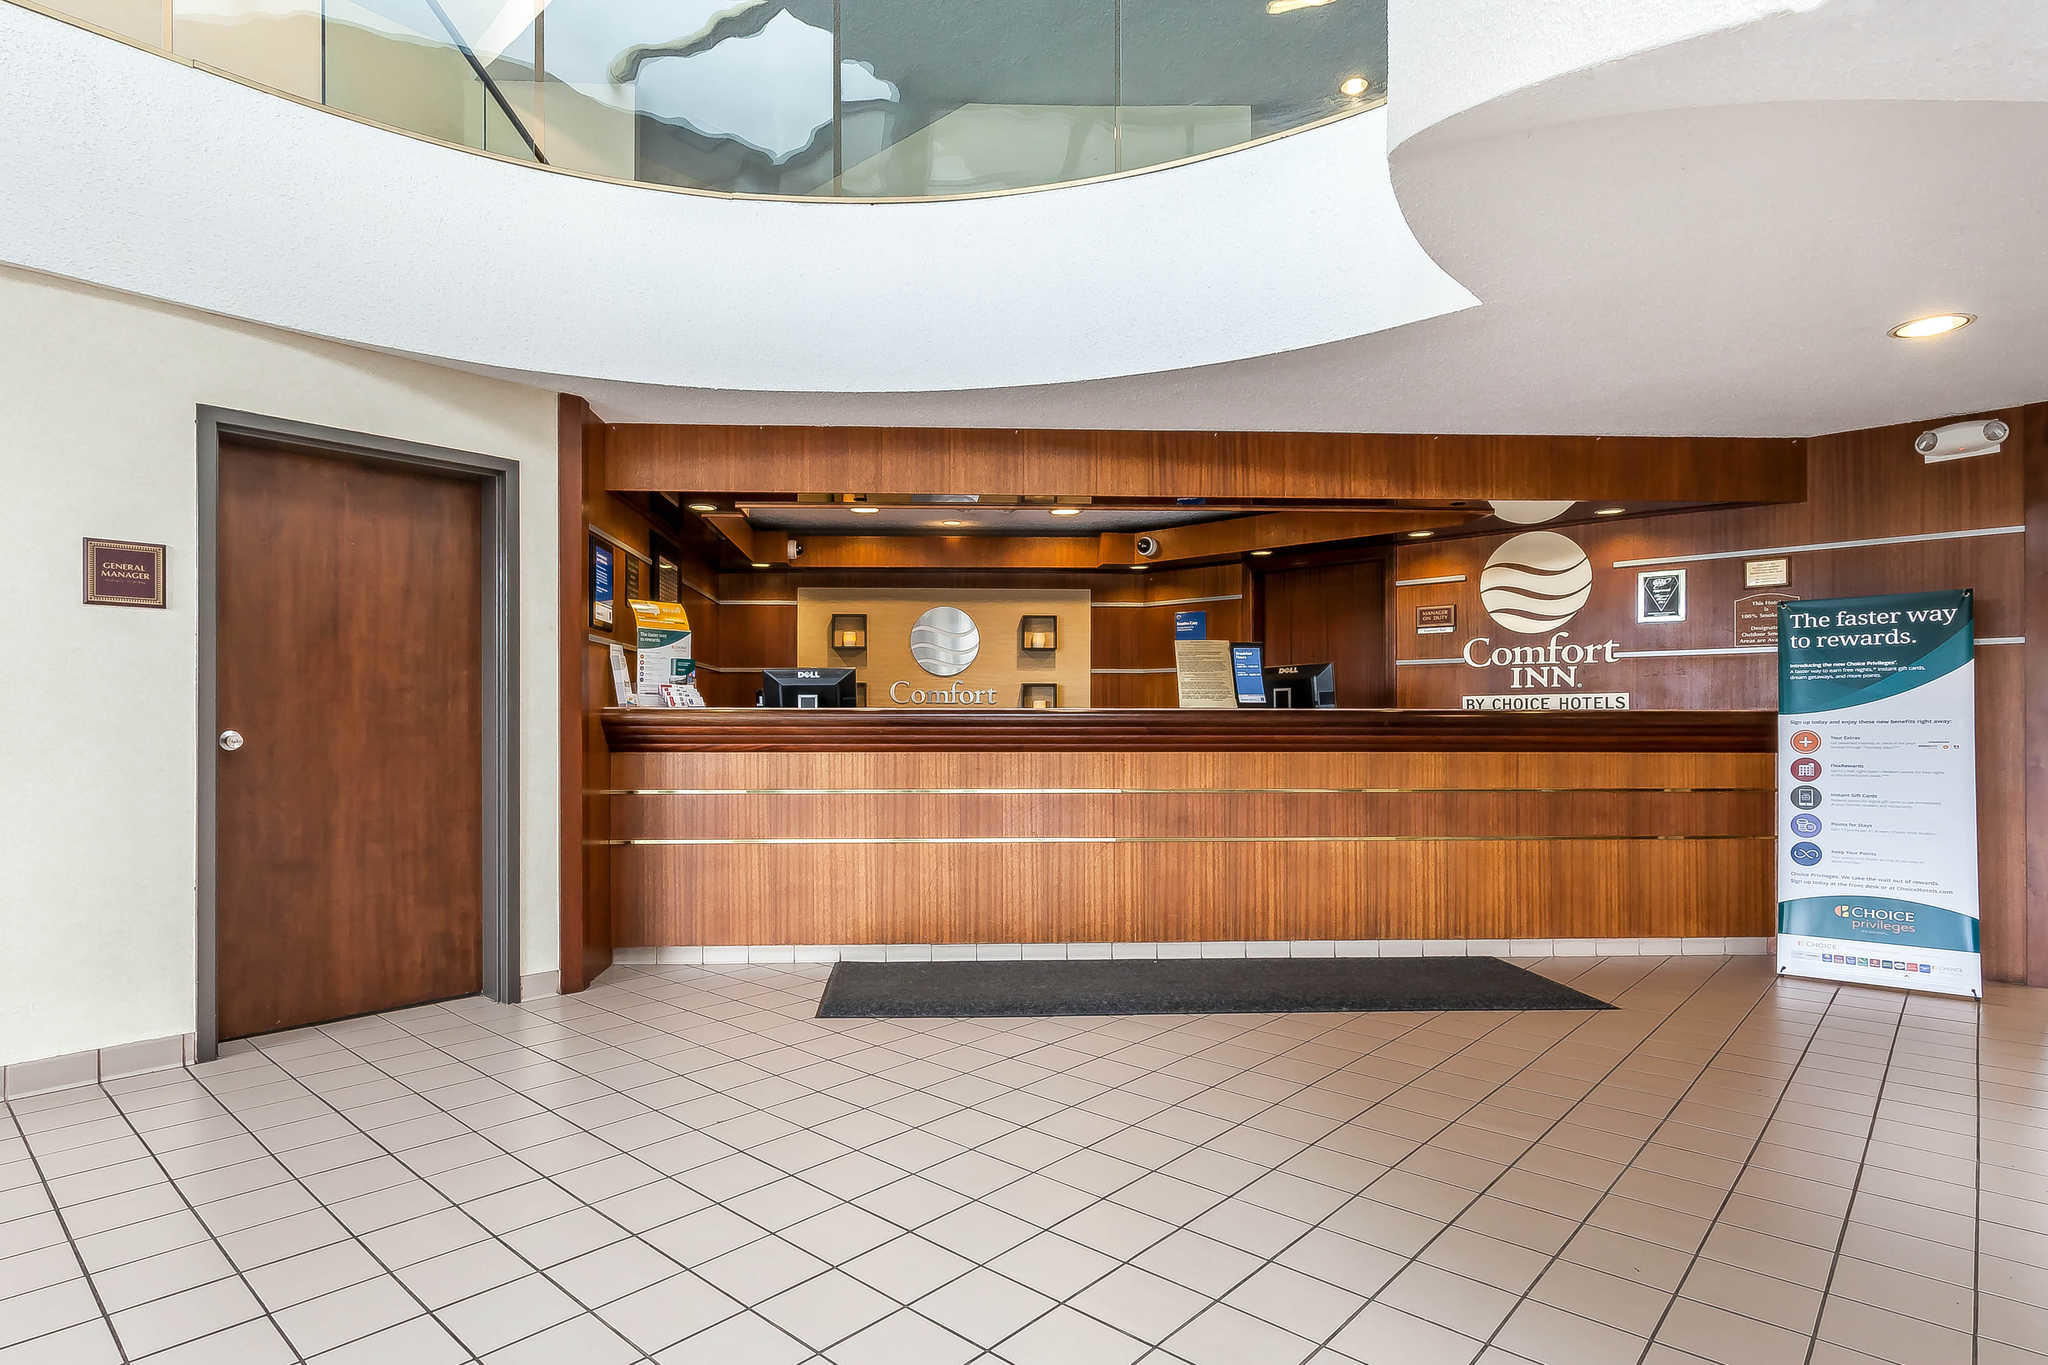 Comfort Inn Cleveland Airport image 4